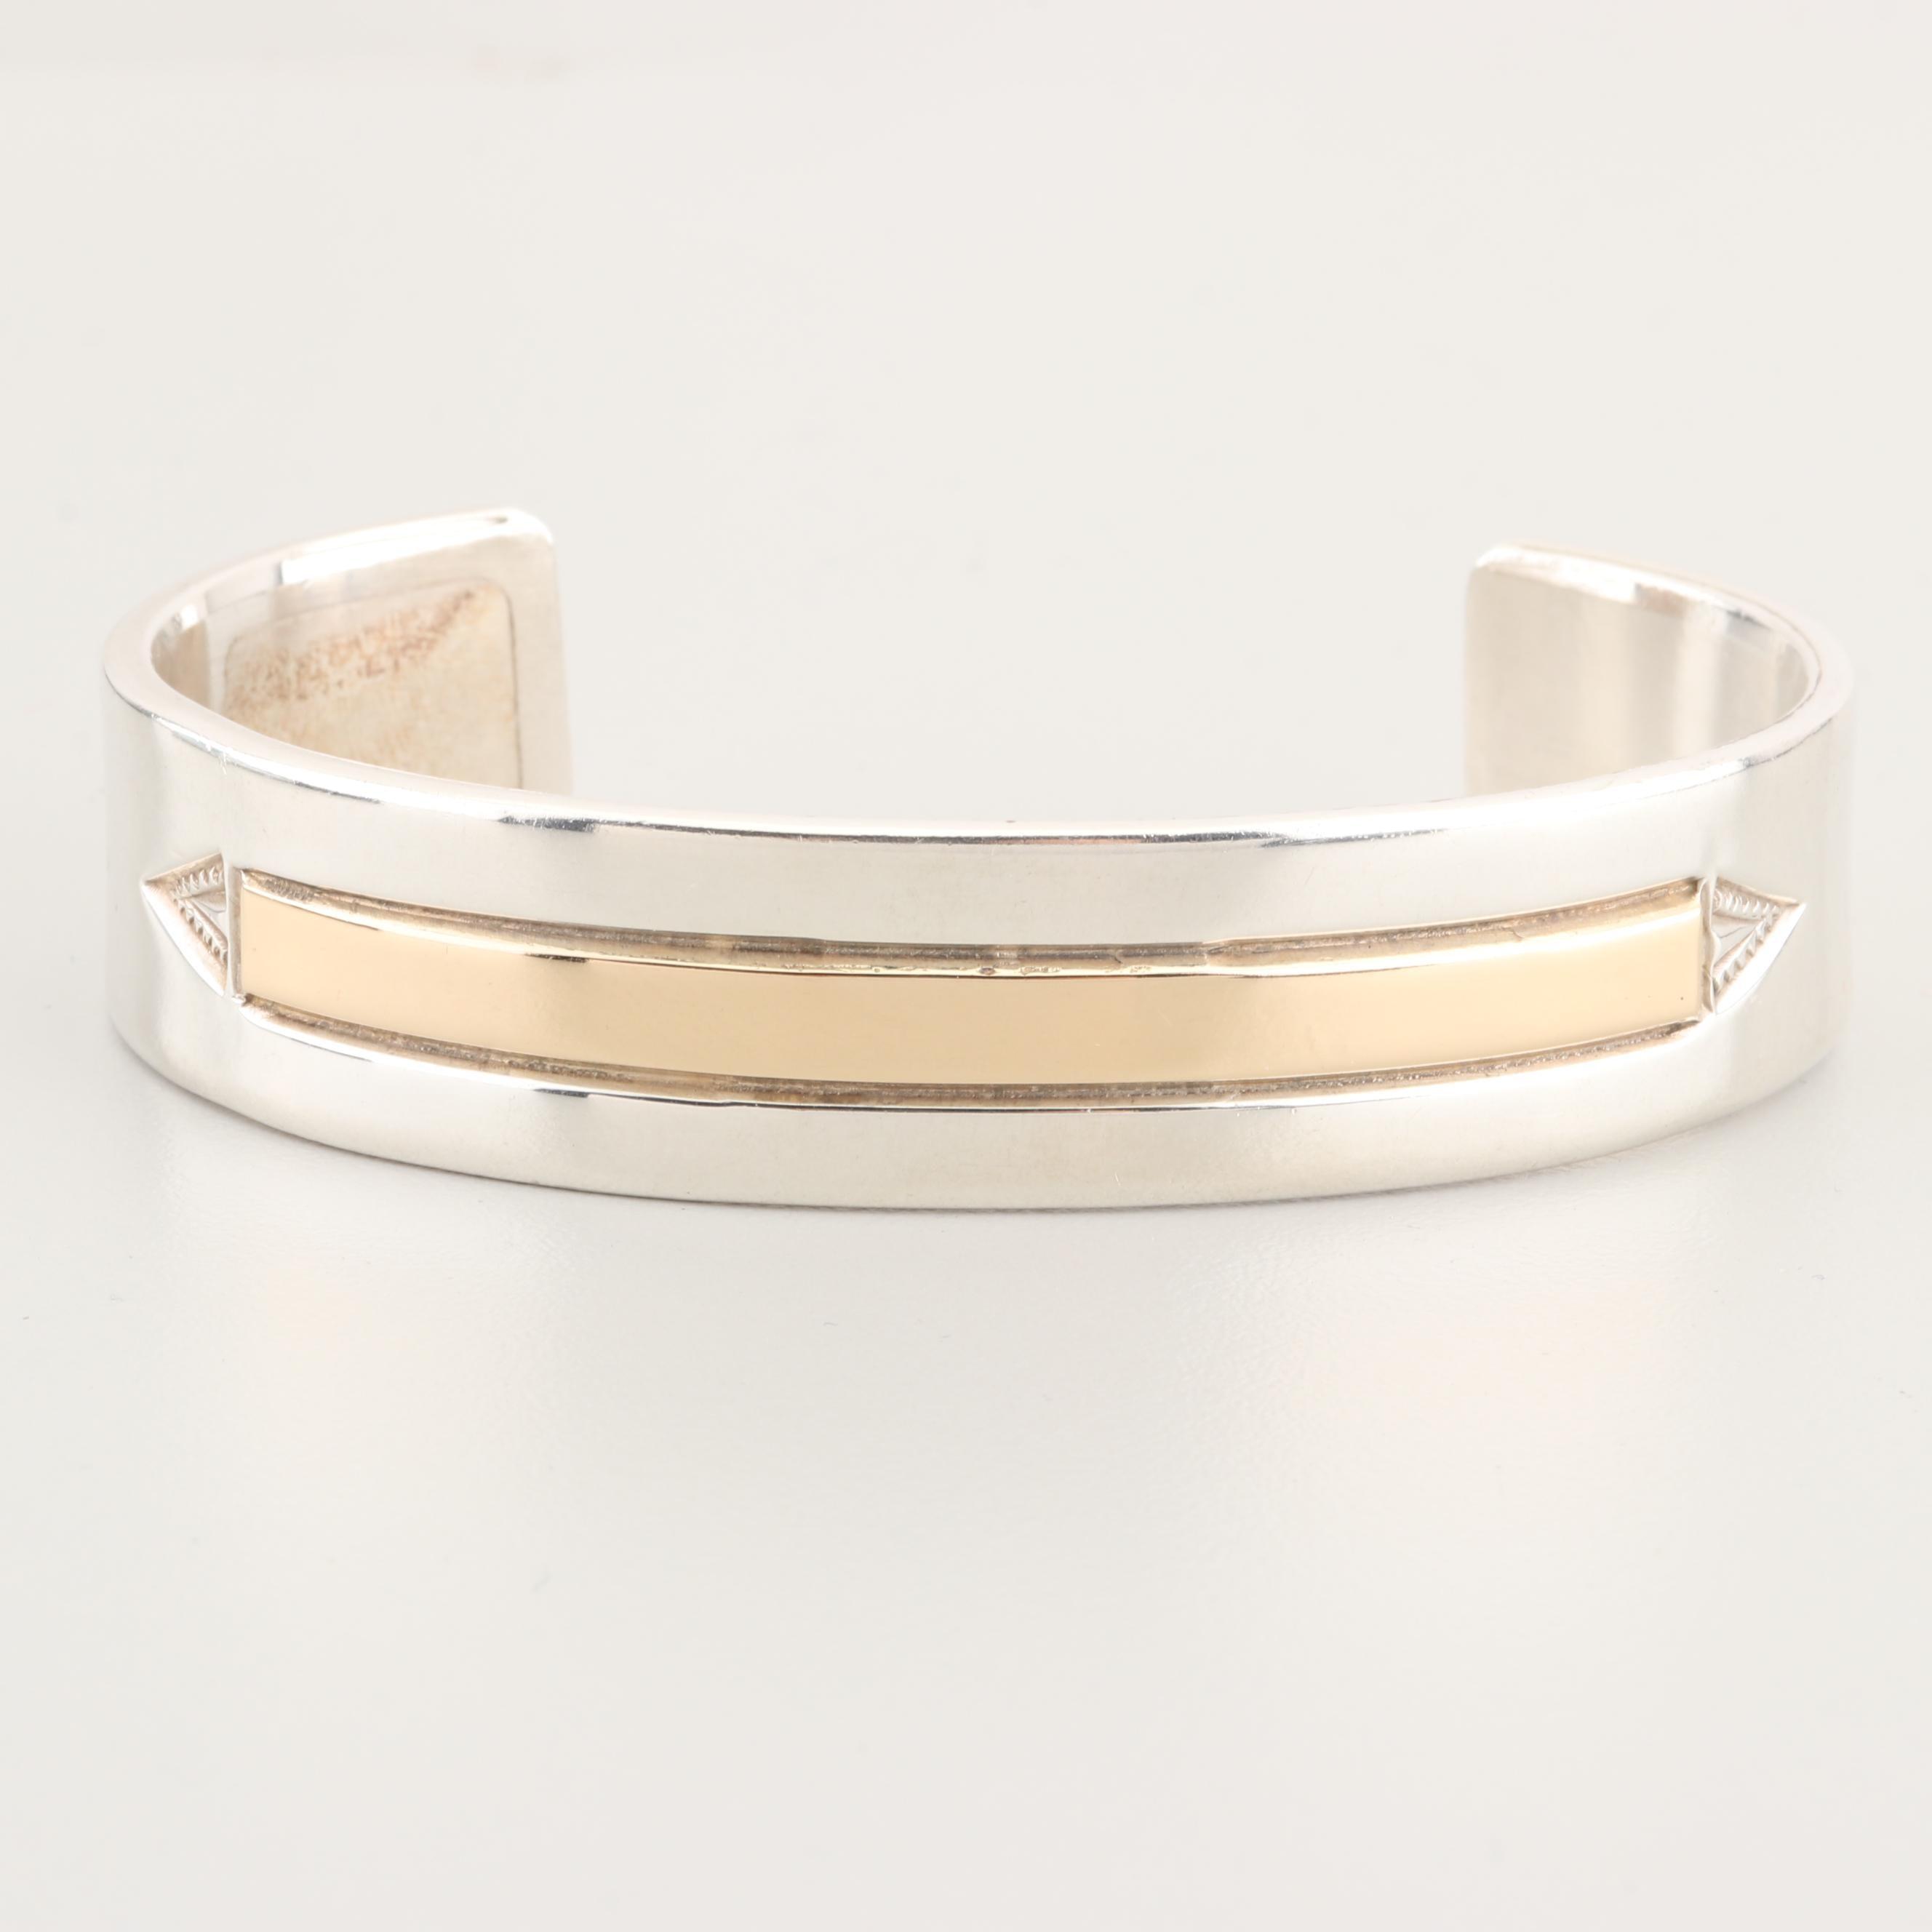 Harold J. Southwest Style Sterling Silver 14K Gold Accented Cuff Bracelet